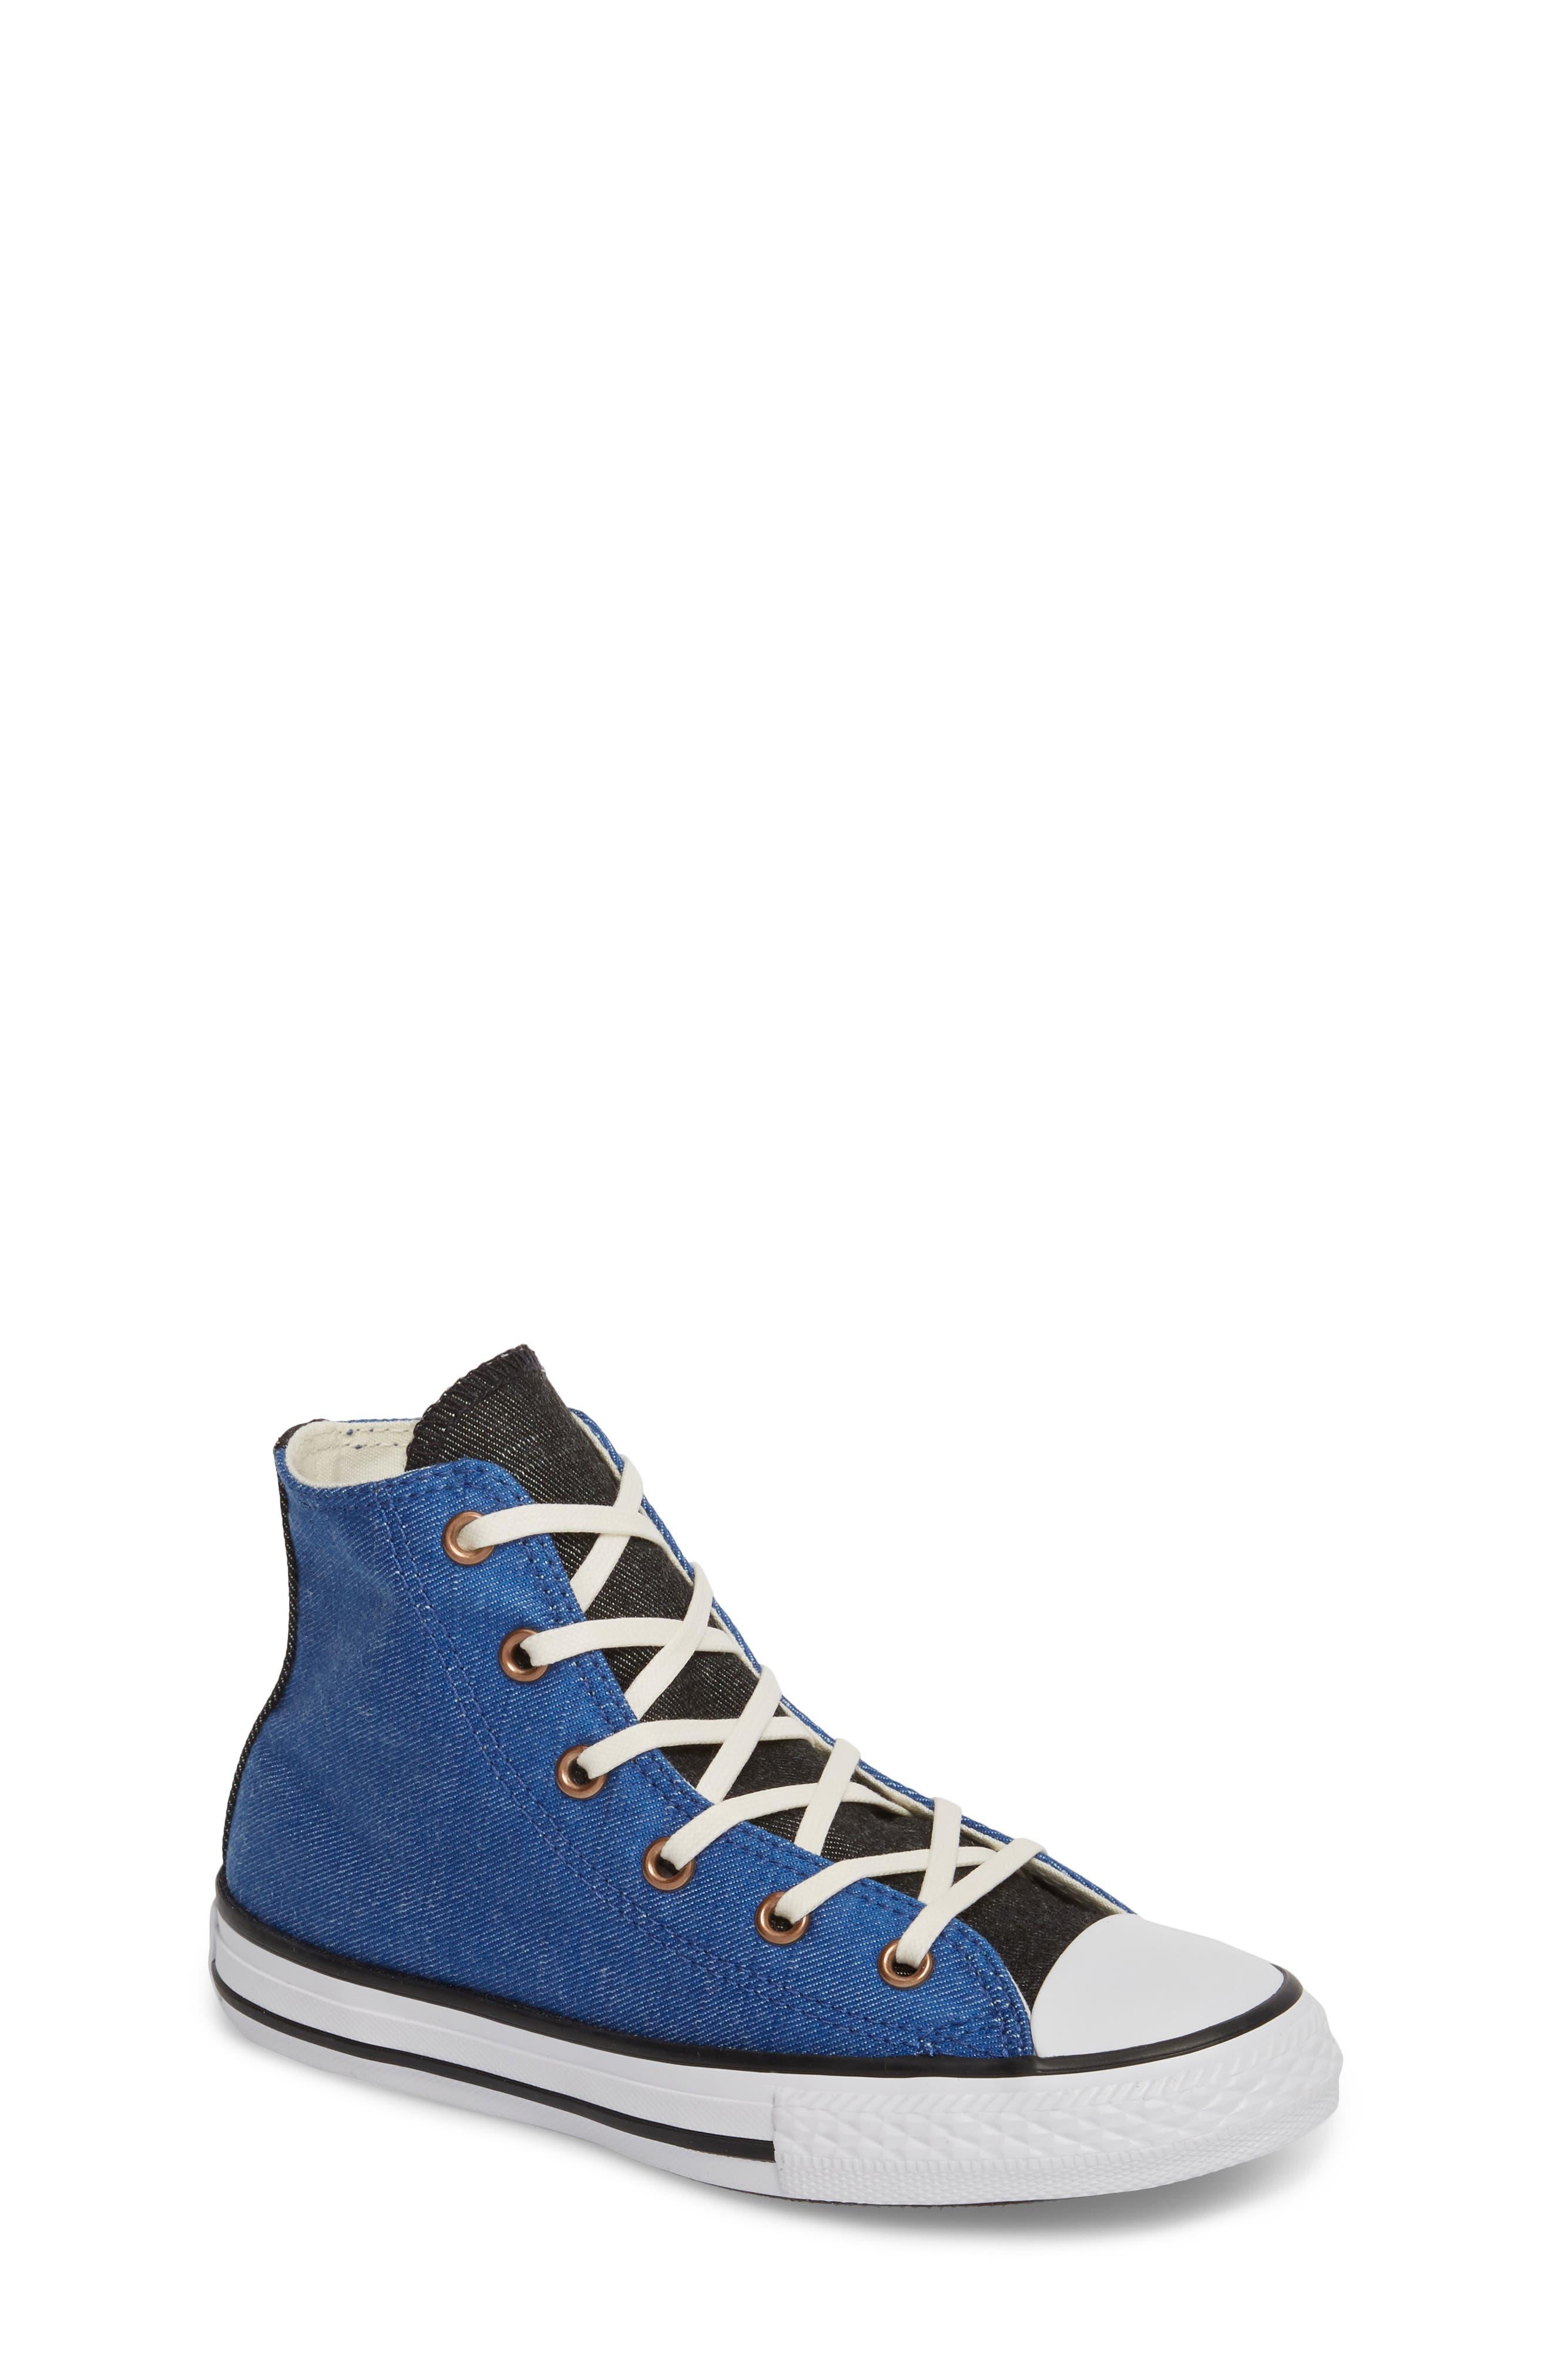 Chuck Taylor<sup>®</sup> All Star<sup>®</sup> Chambray High Top Sneaker,                             Main thumbnail 1, color,                             Nightfall Blue